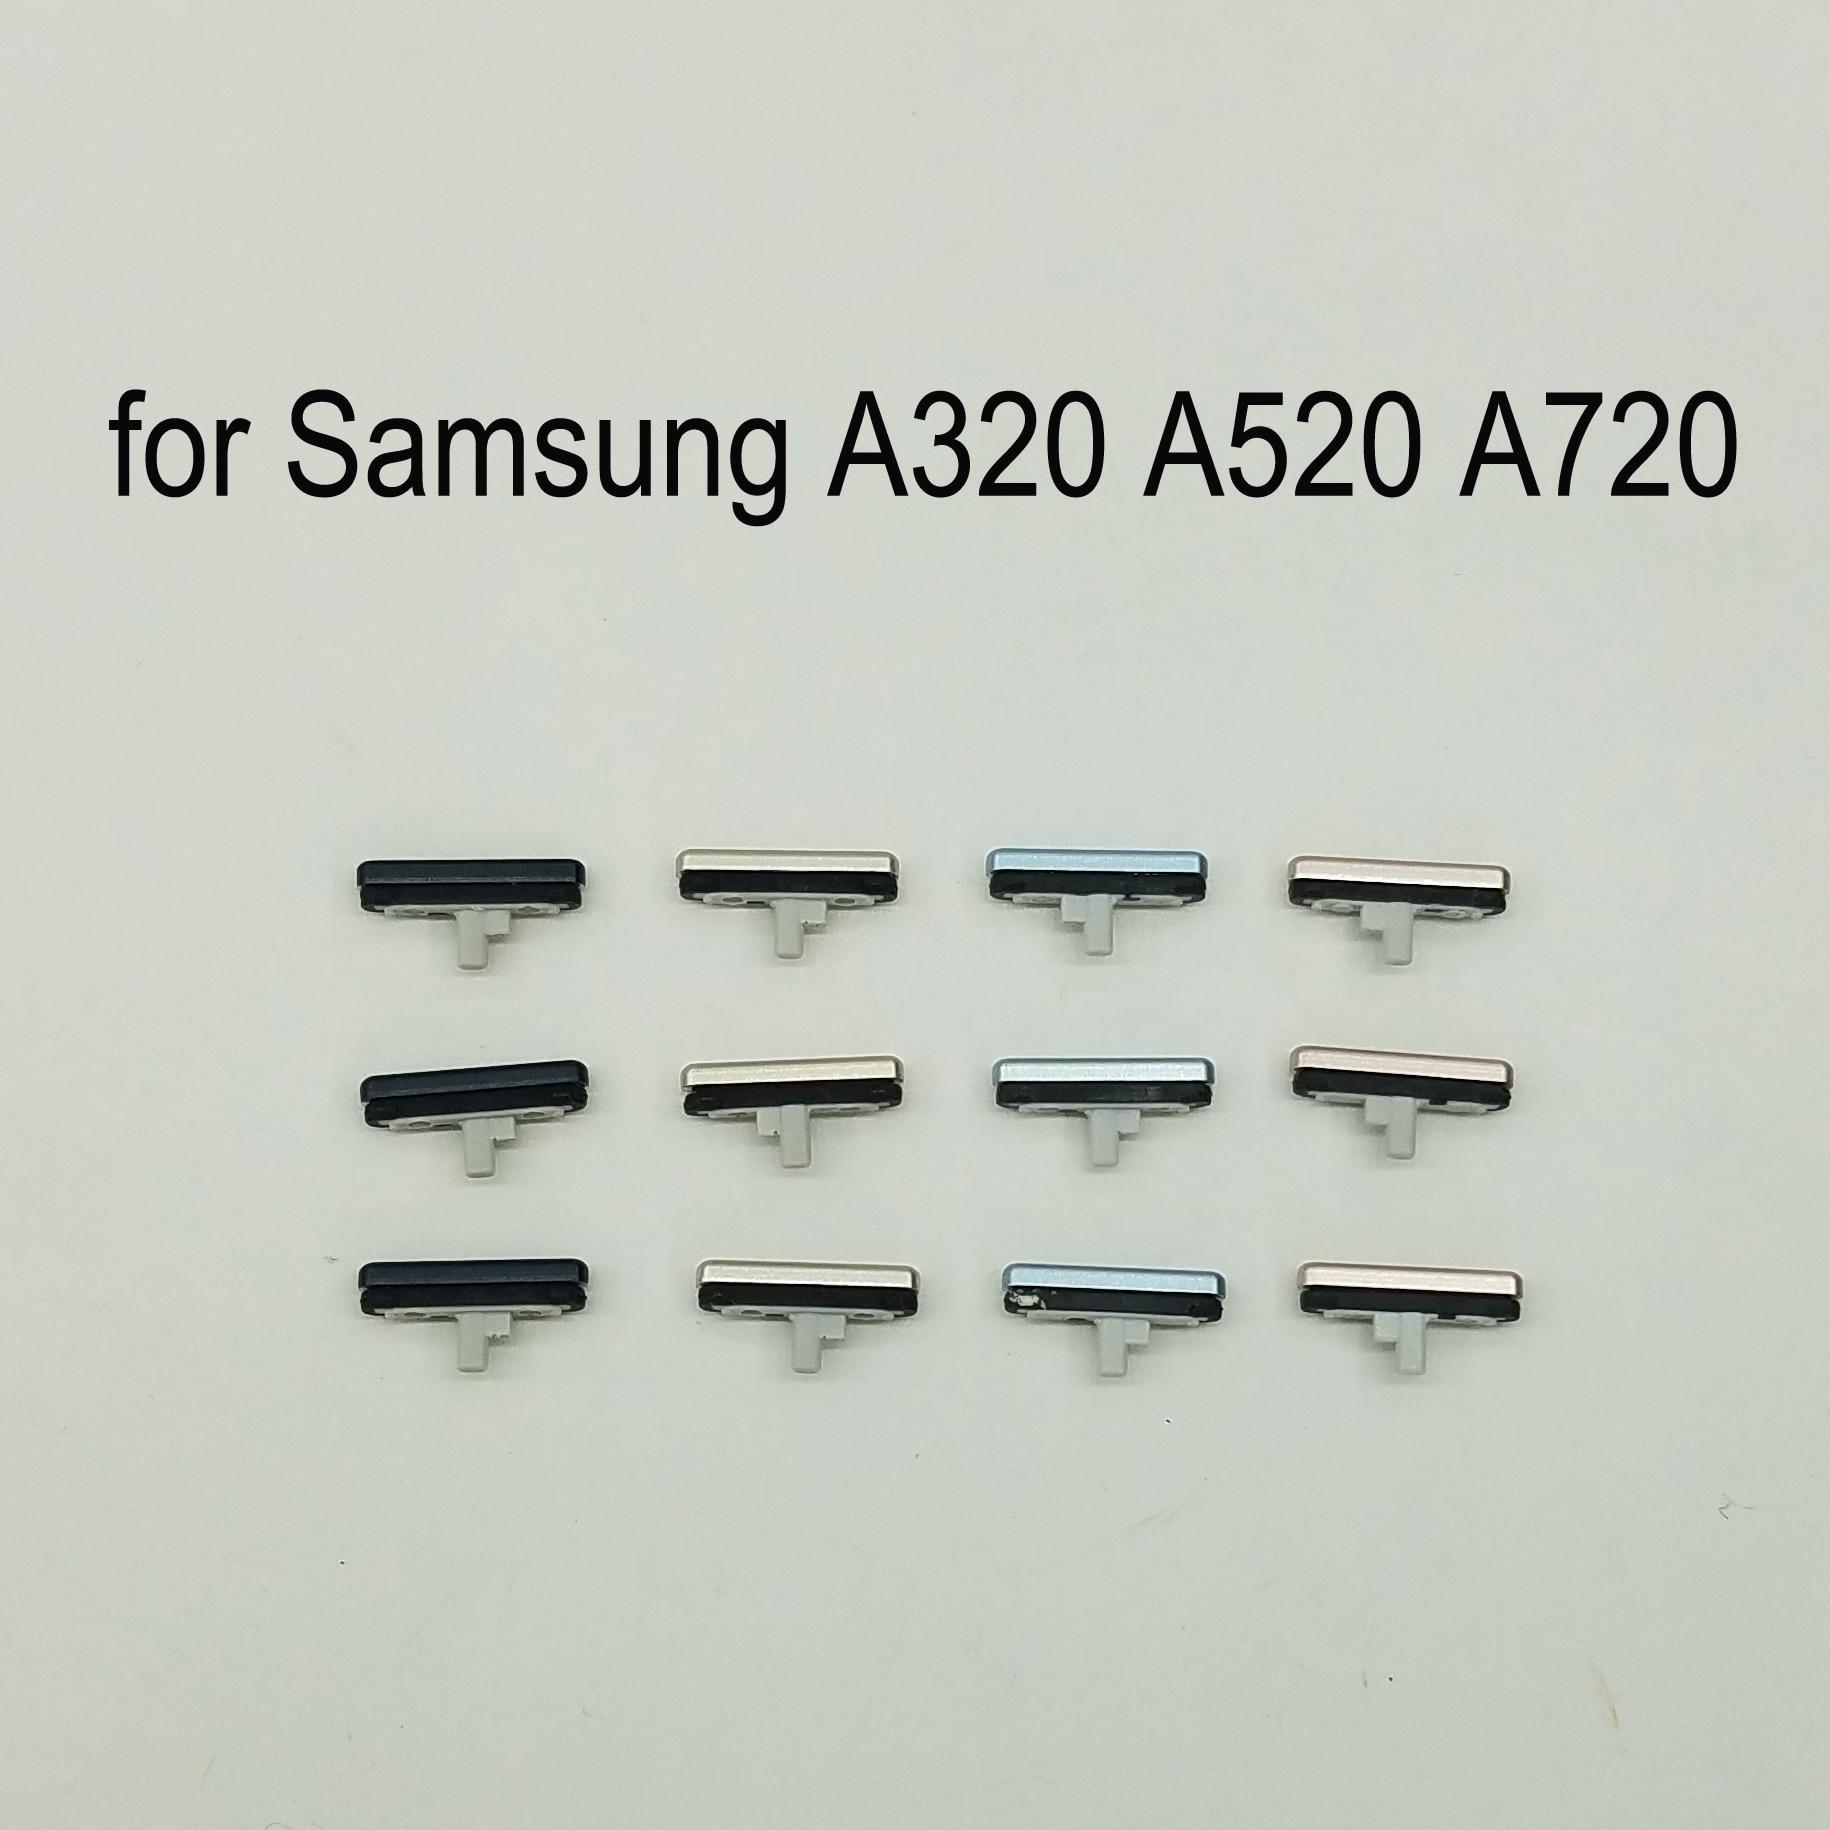 3pcs For Samsung Galaxy A3 A5 A7 2017 A320 A520 A720 Phone Housing Frame Volume Power Button Side Key